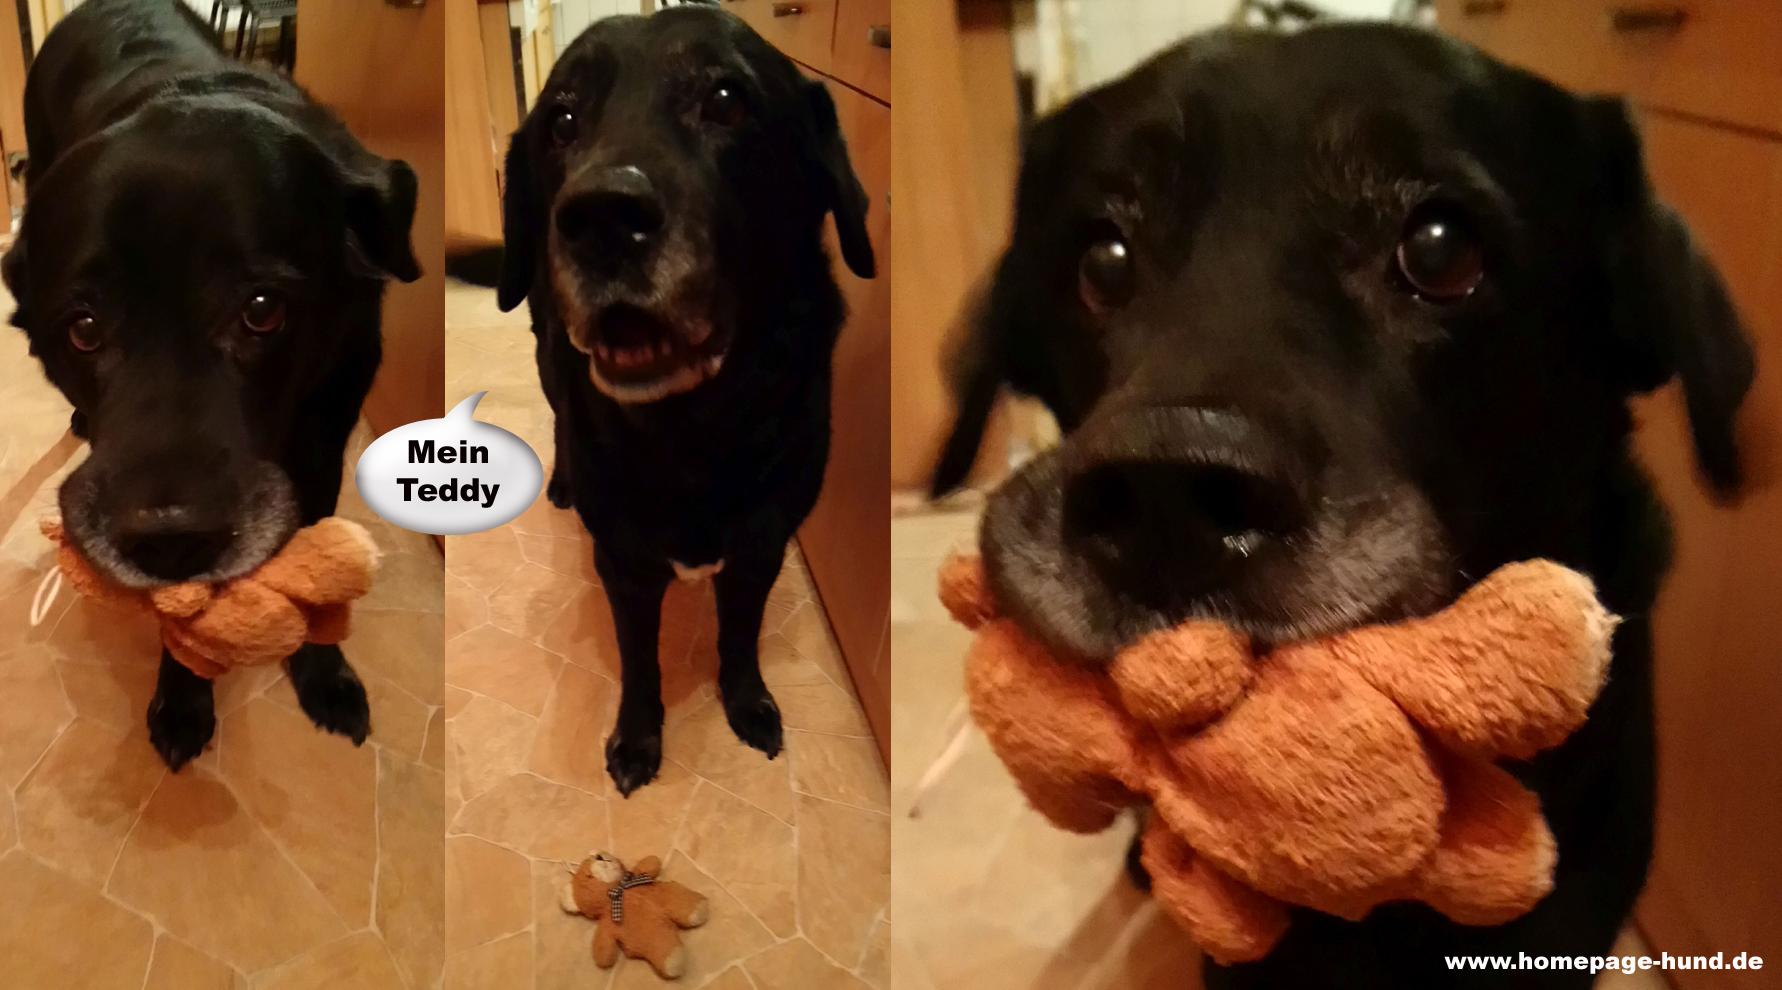 Hund Teddy